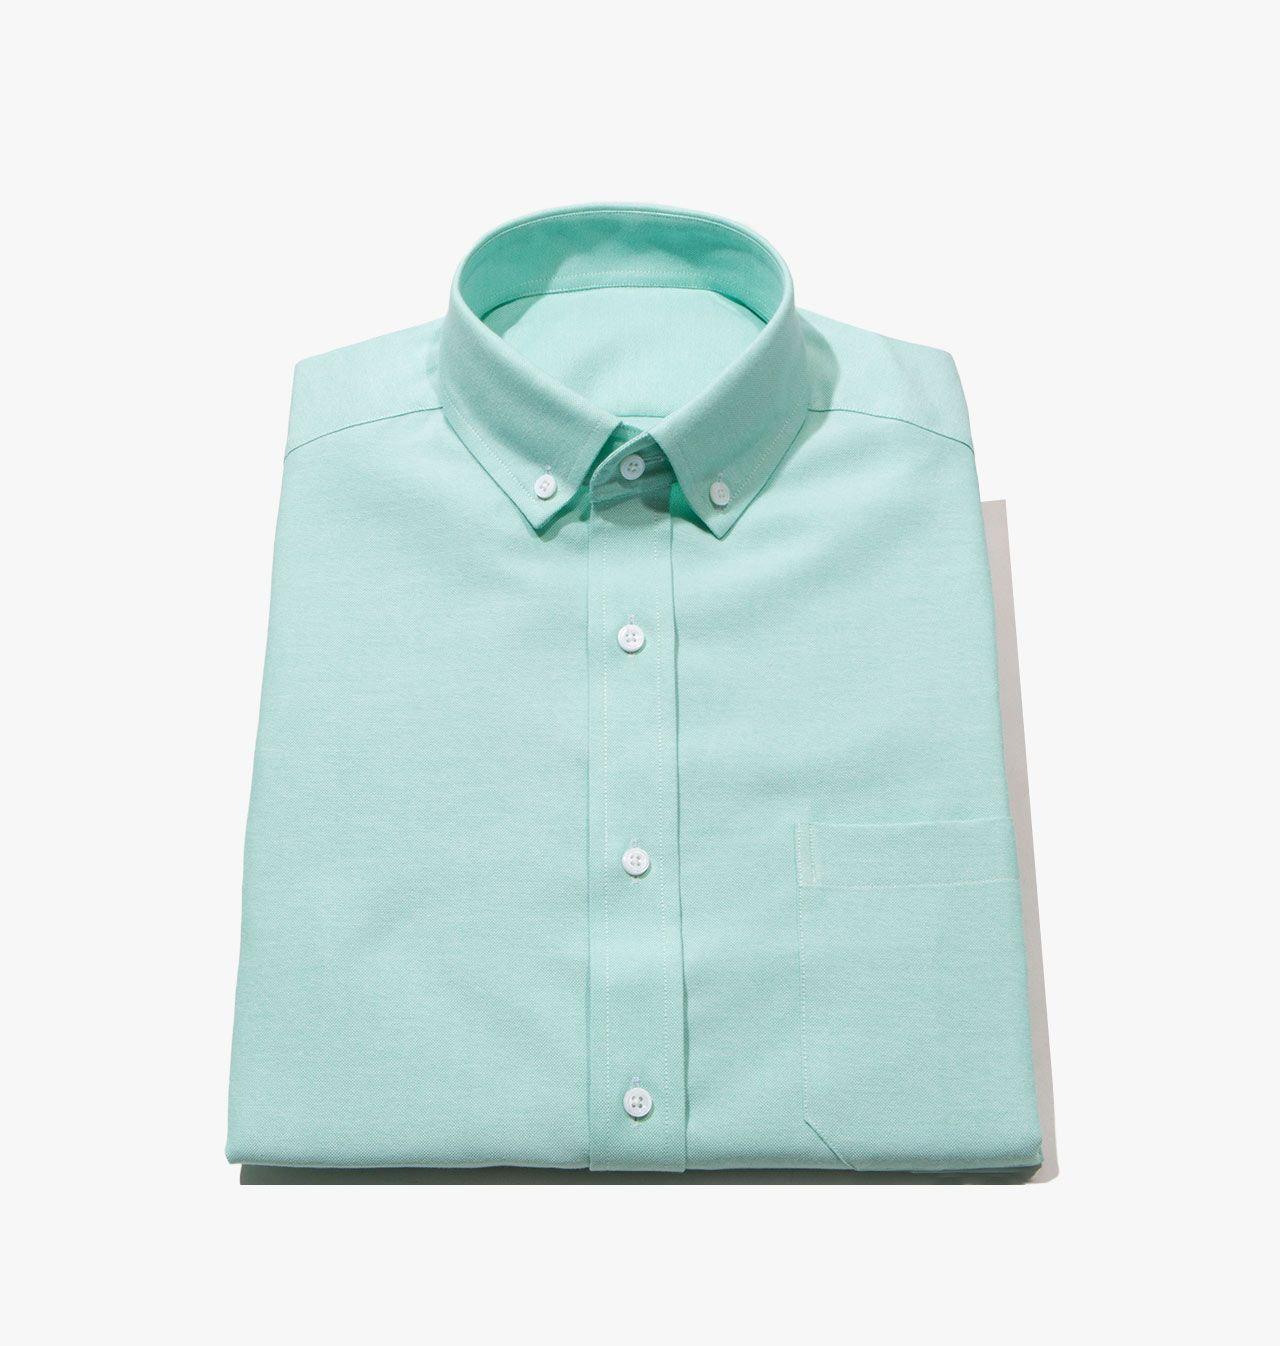 Men S Fitted Mint Green Oxford Dress Shirt 1450 Mens Shirts Online Shirts Tailored Shirts